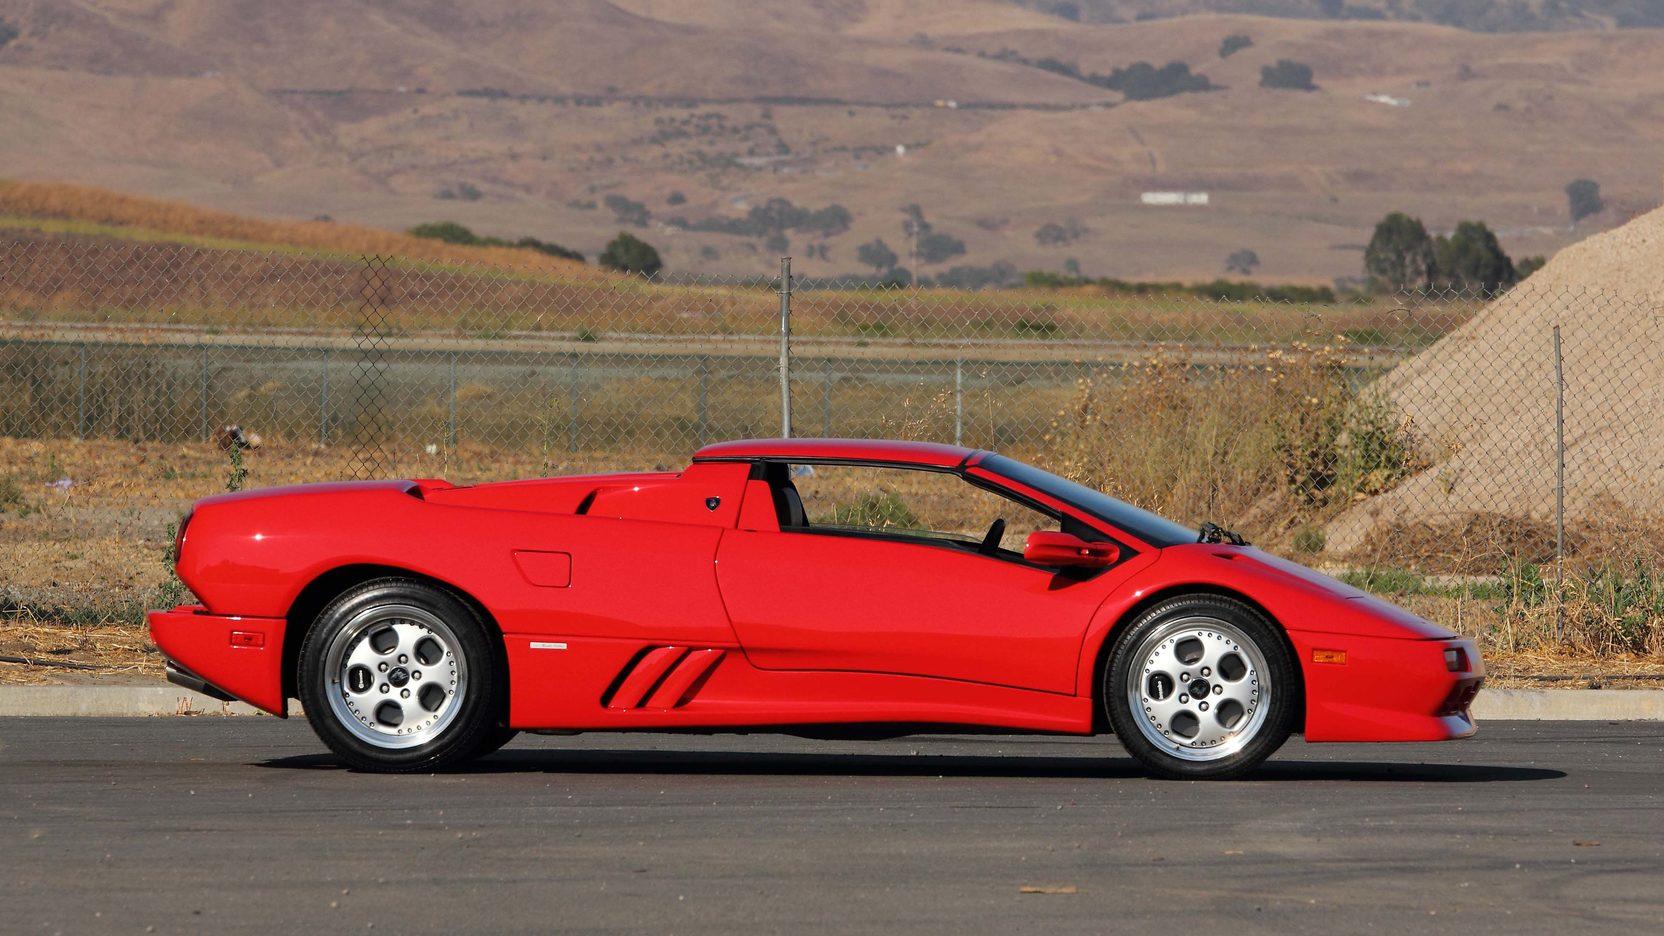 Buy This Lamborghini Diablo Get An Autographed George